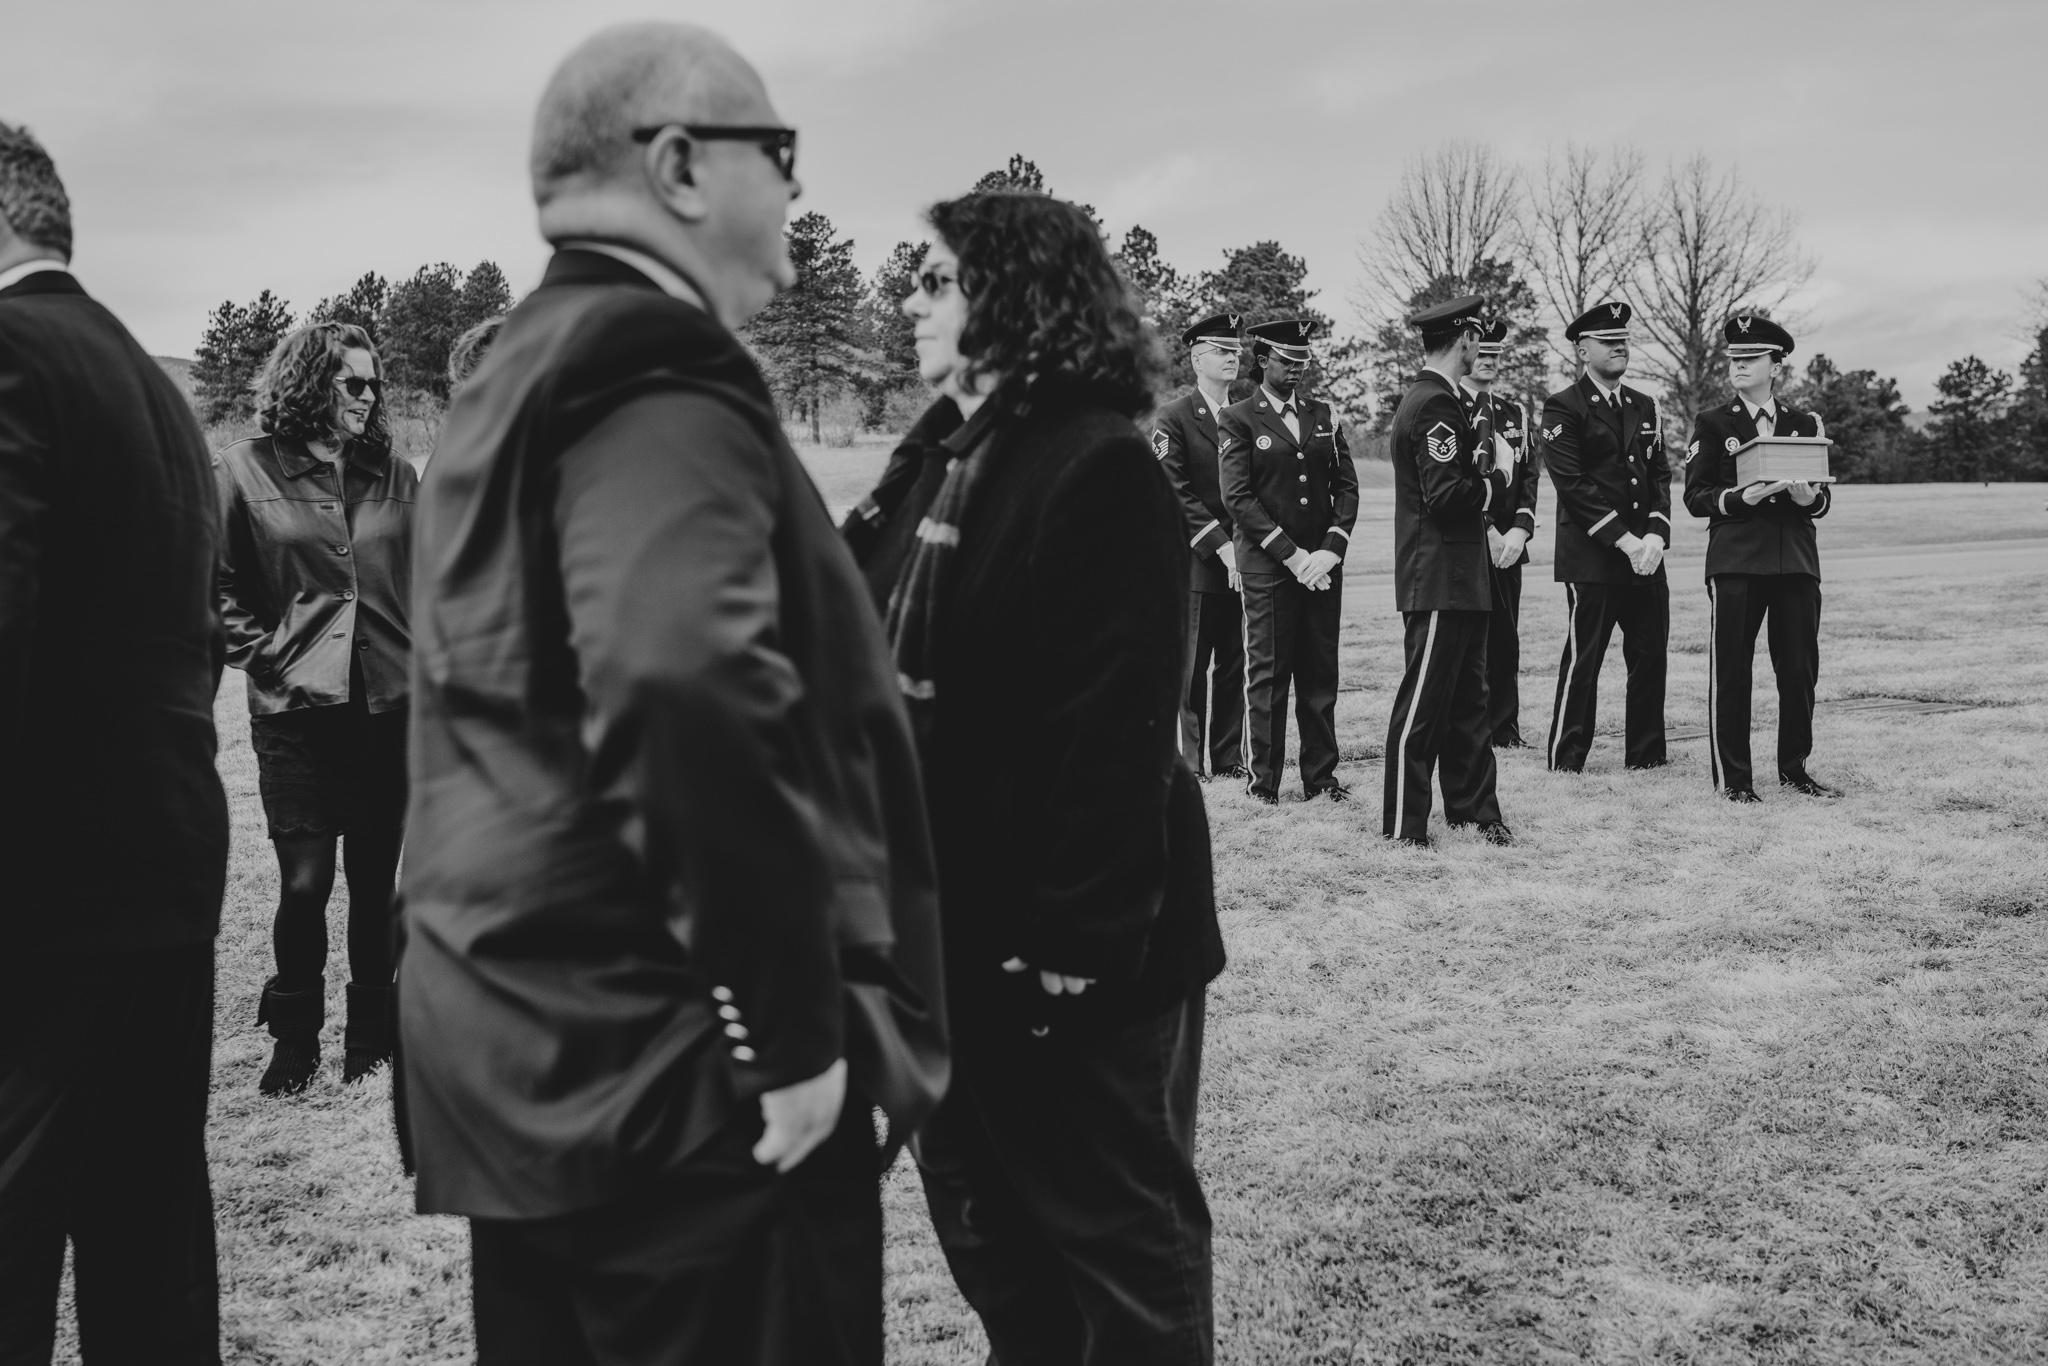 usafa-colorado-military-honours-burial-funeral-photography-grace-elizabeth-colchester-essex-alternative-wedding-lifestyle-photographer (11 of 127).jpg